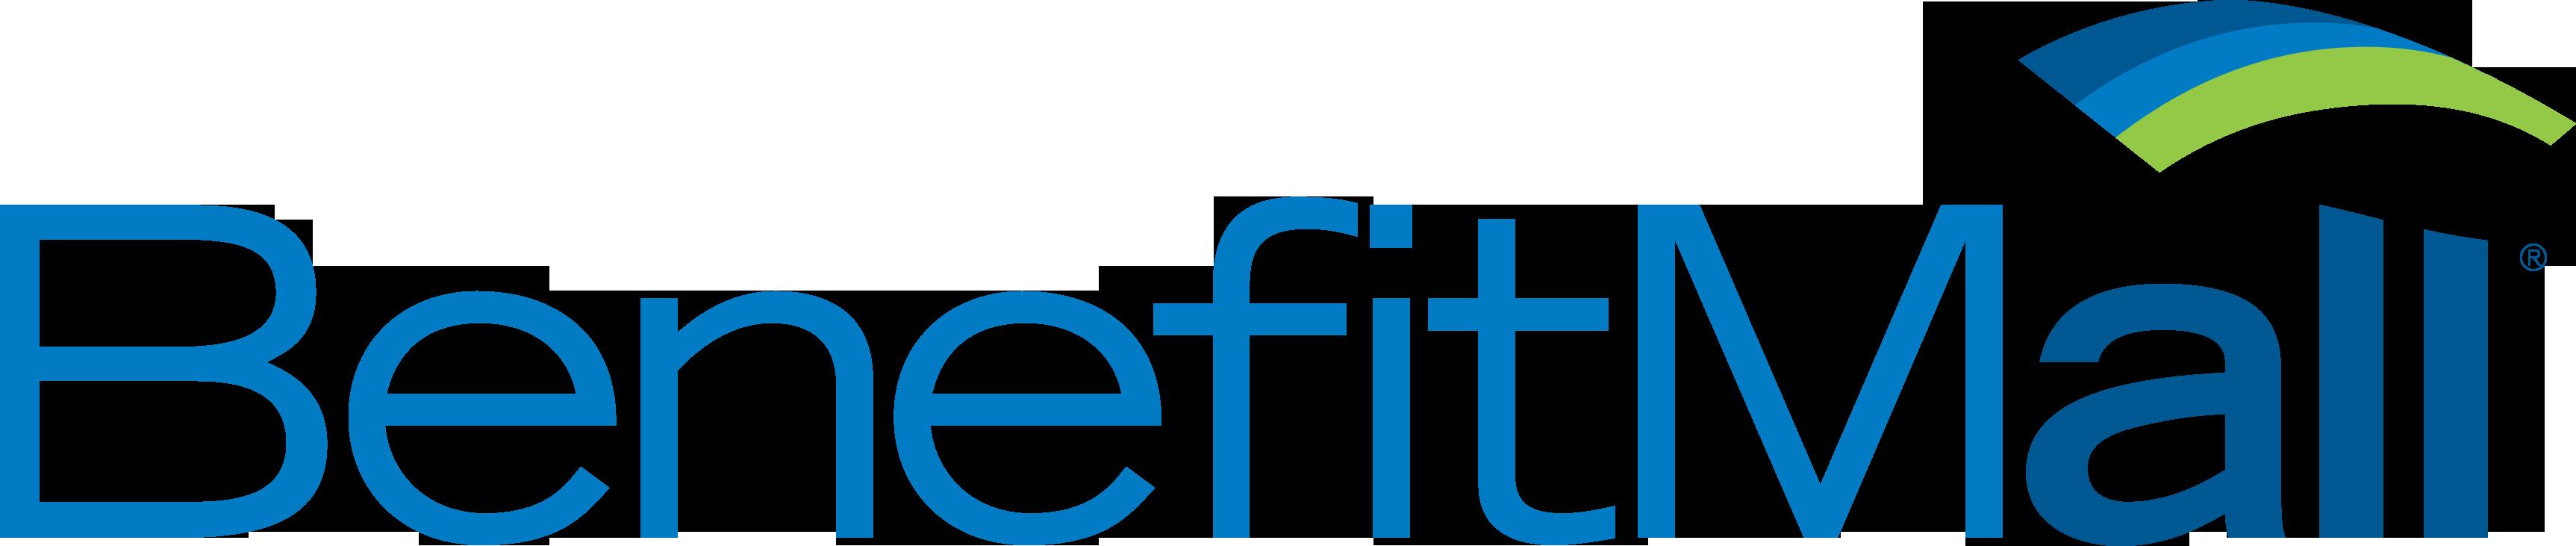 BenefitMall logo